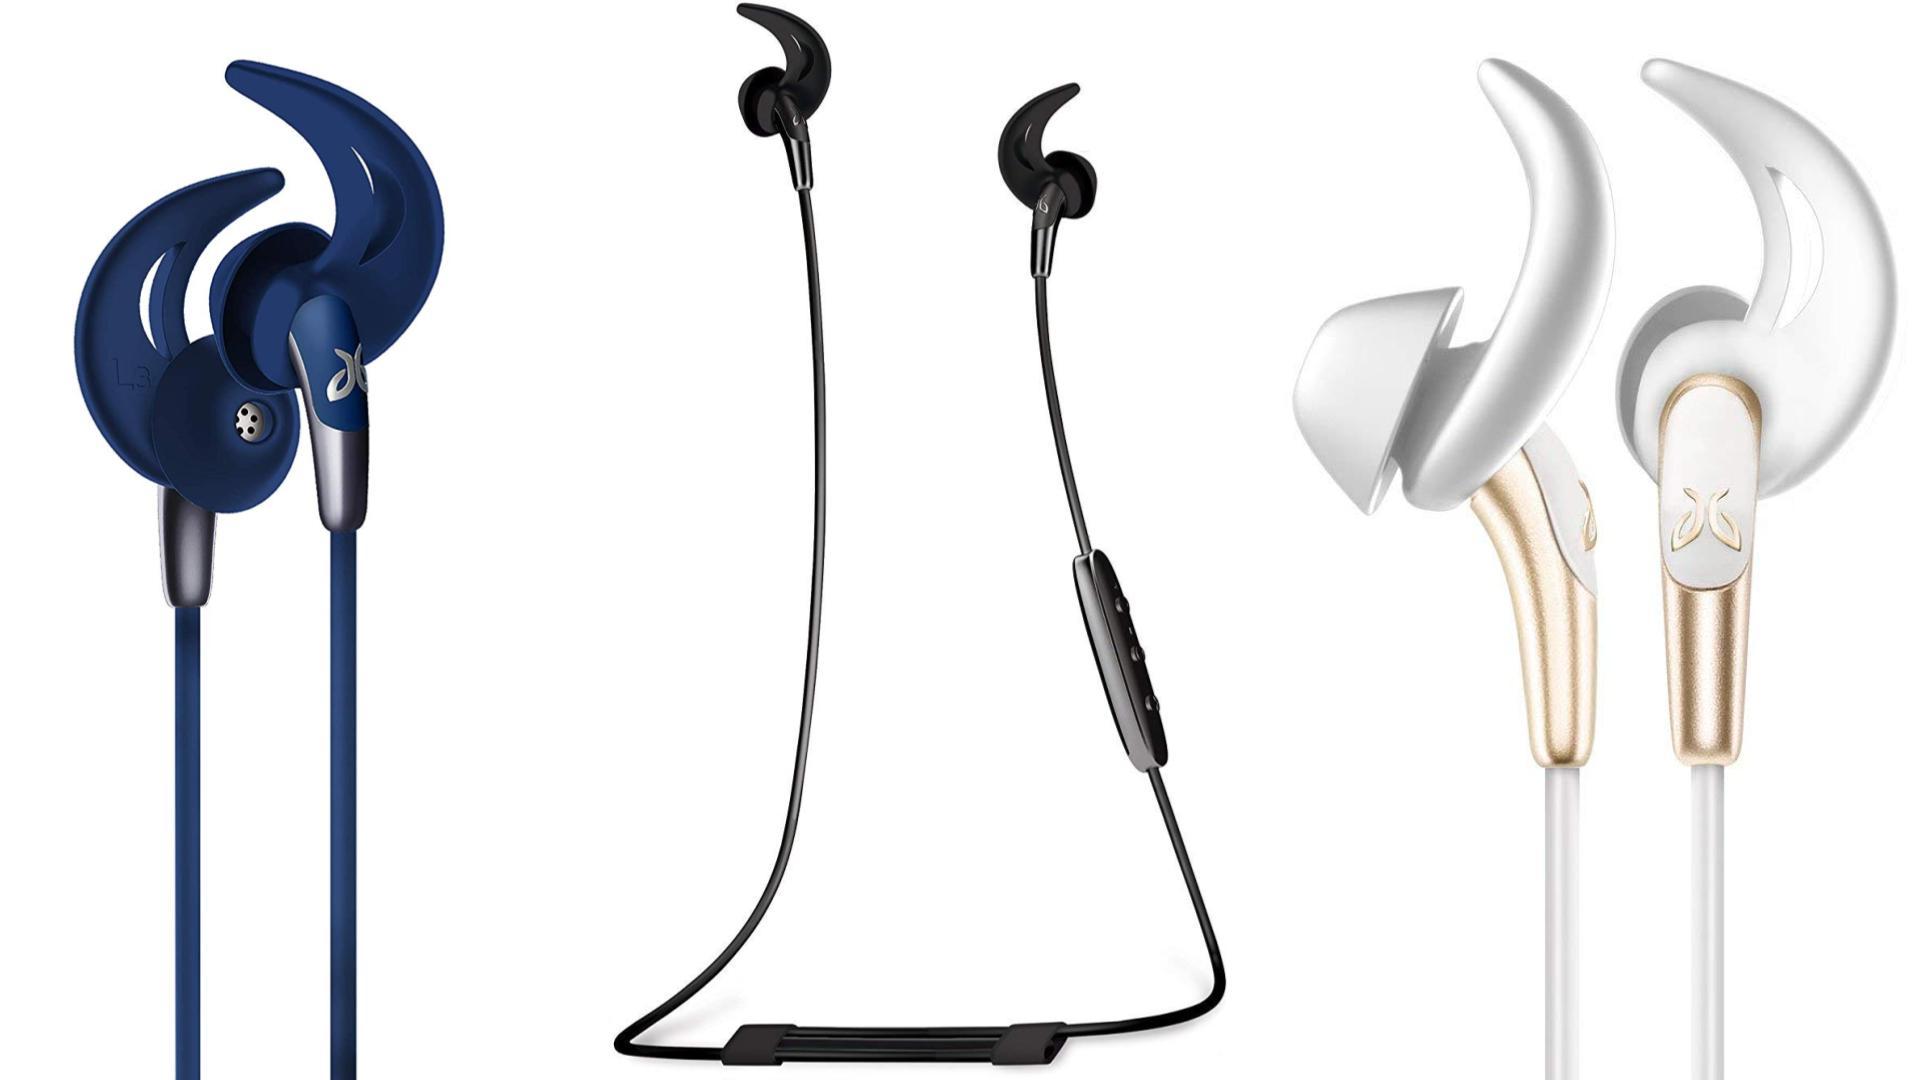 🔥 Black Friday : les écouteurs sans fil Jaybird Freedom 2 à 59 euros chez Amazon